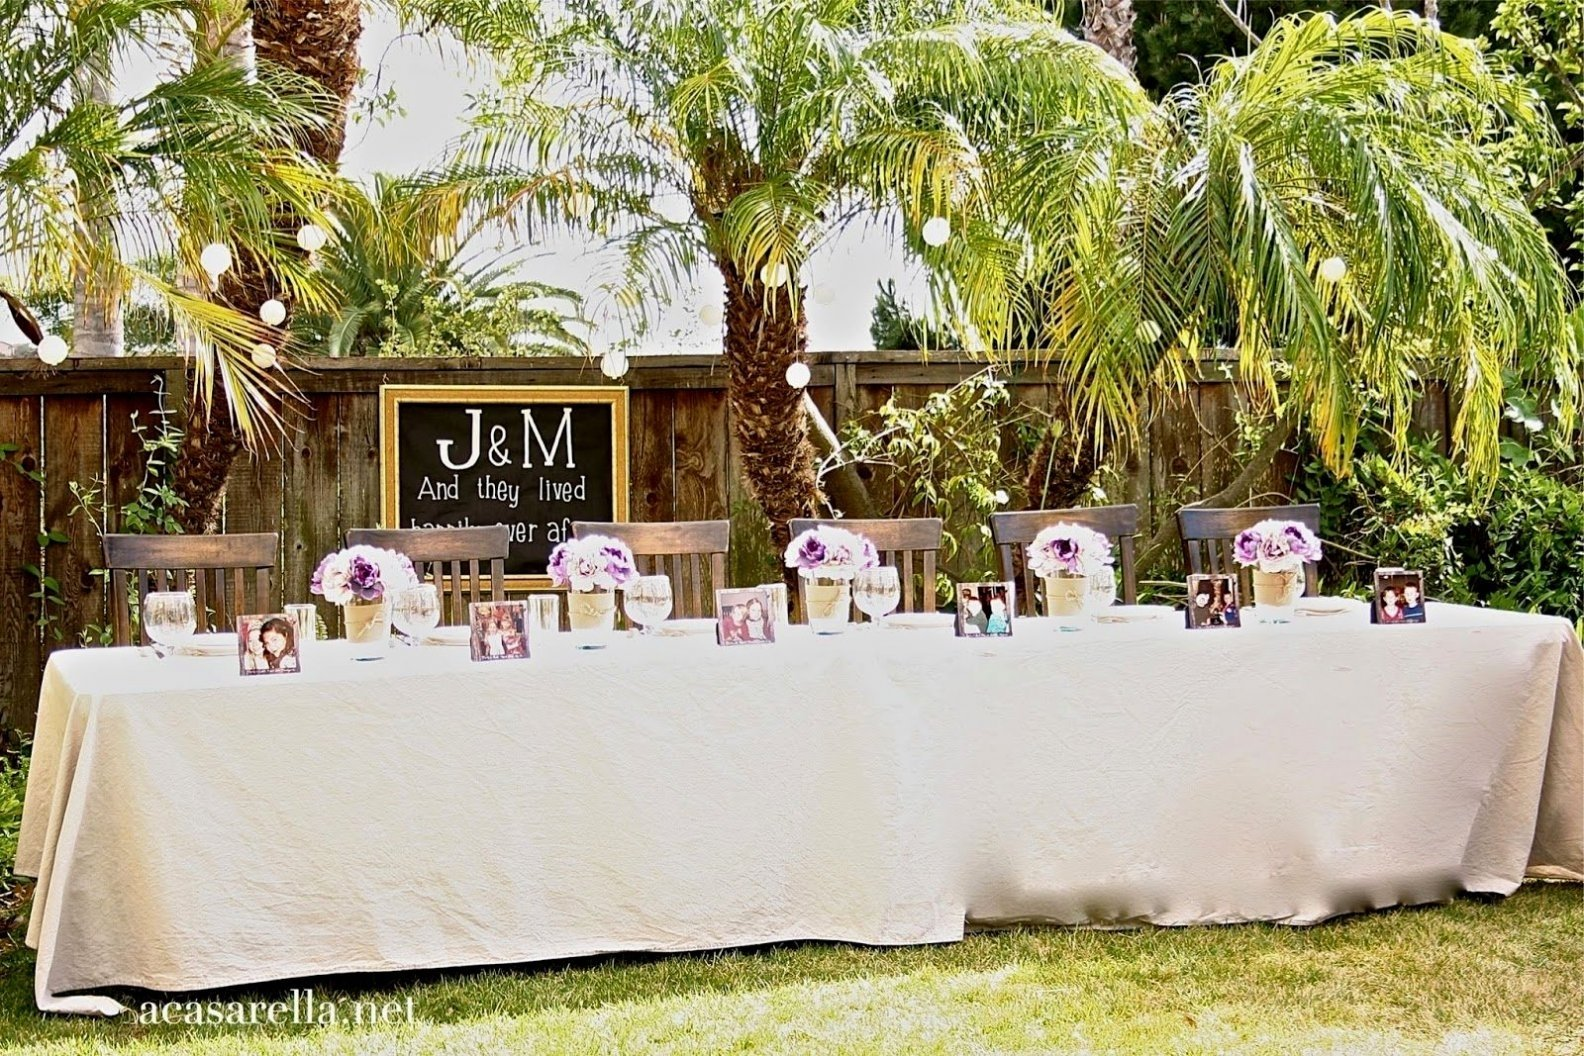 10 Cute Backyard Wedding Ideas For Summer backyard wedding ideas amazing backyard wedding ideas for summer 2020